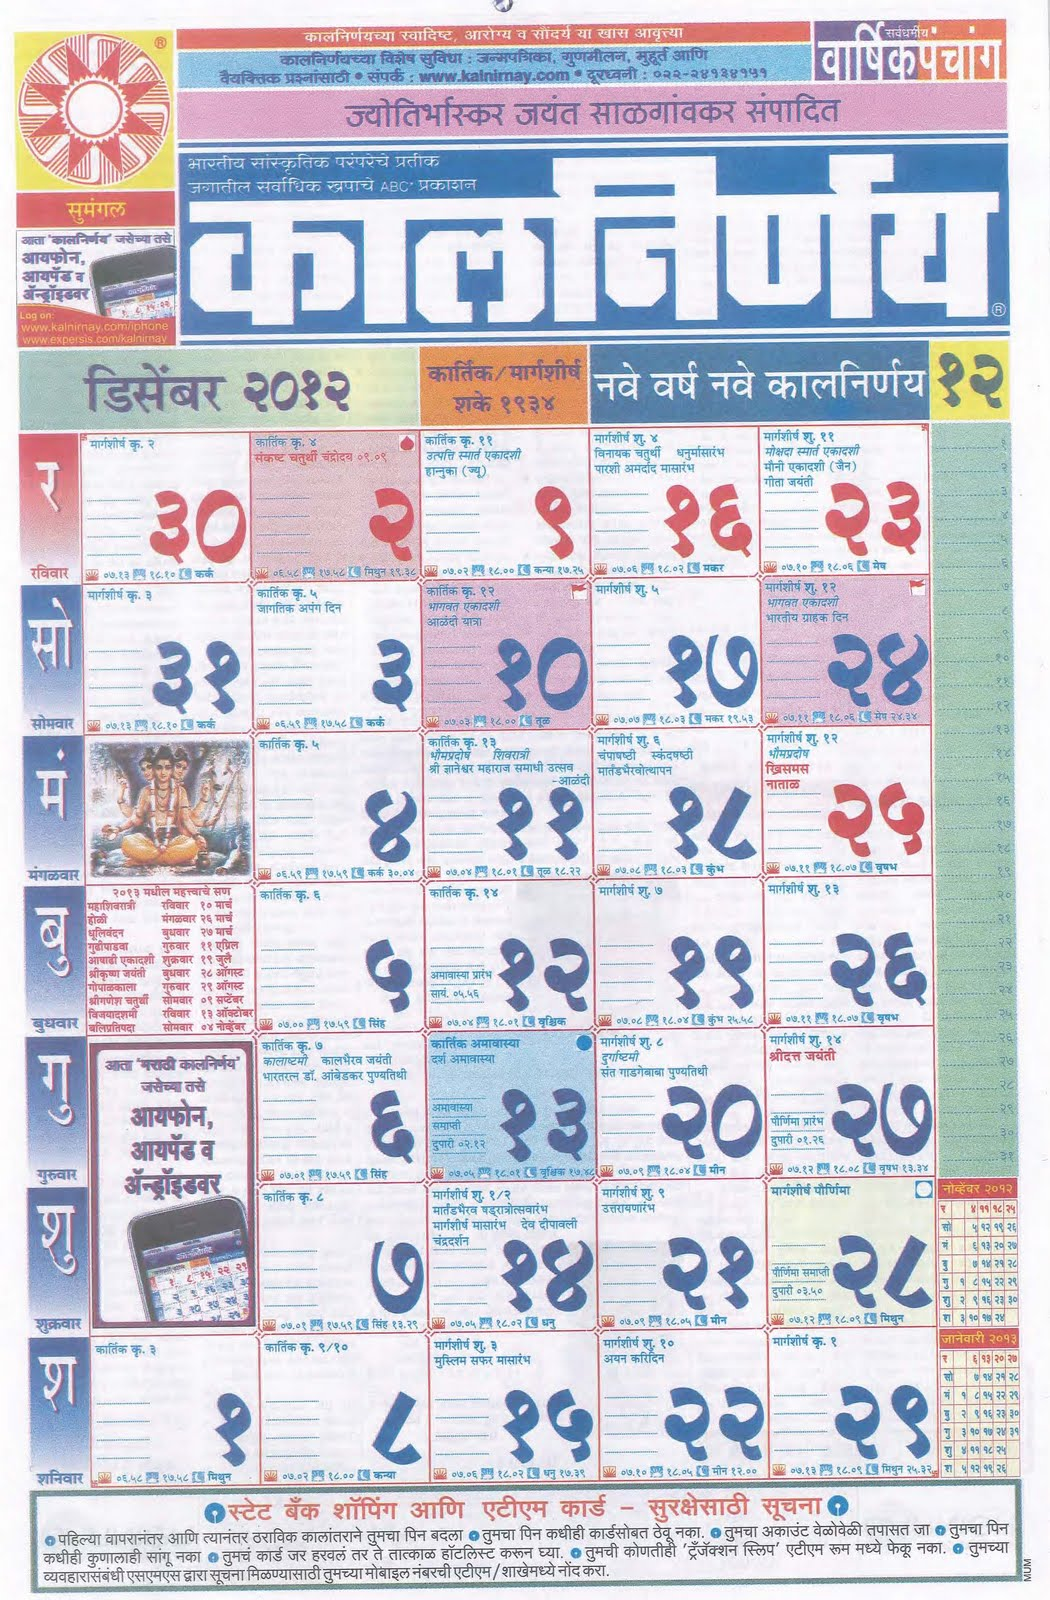 Kalnirnay Marathi Calendar 2012 Pdf